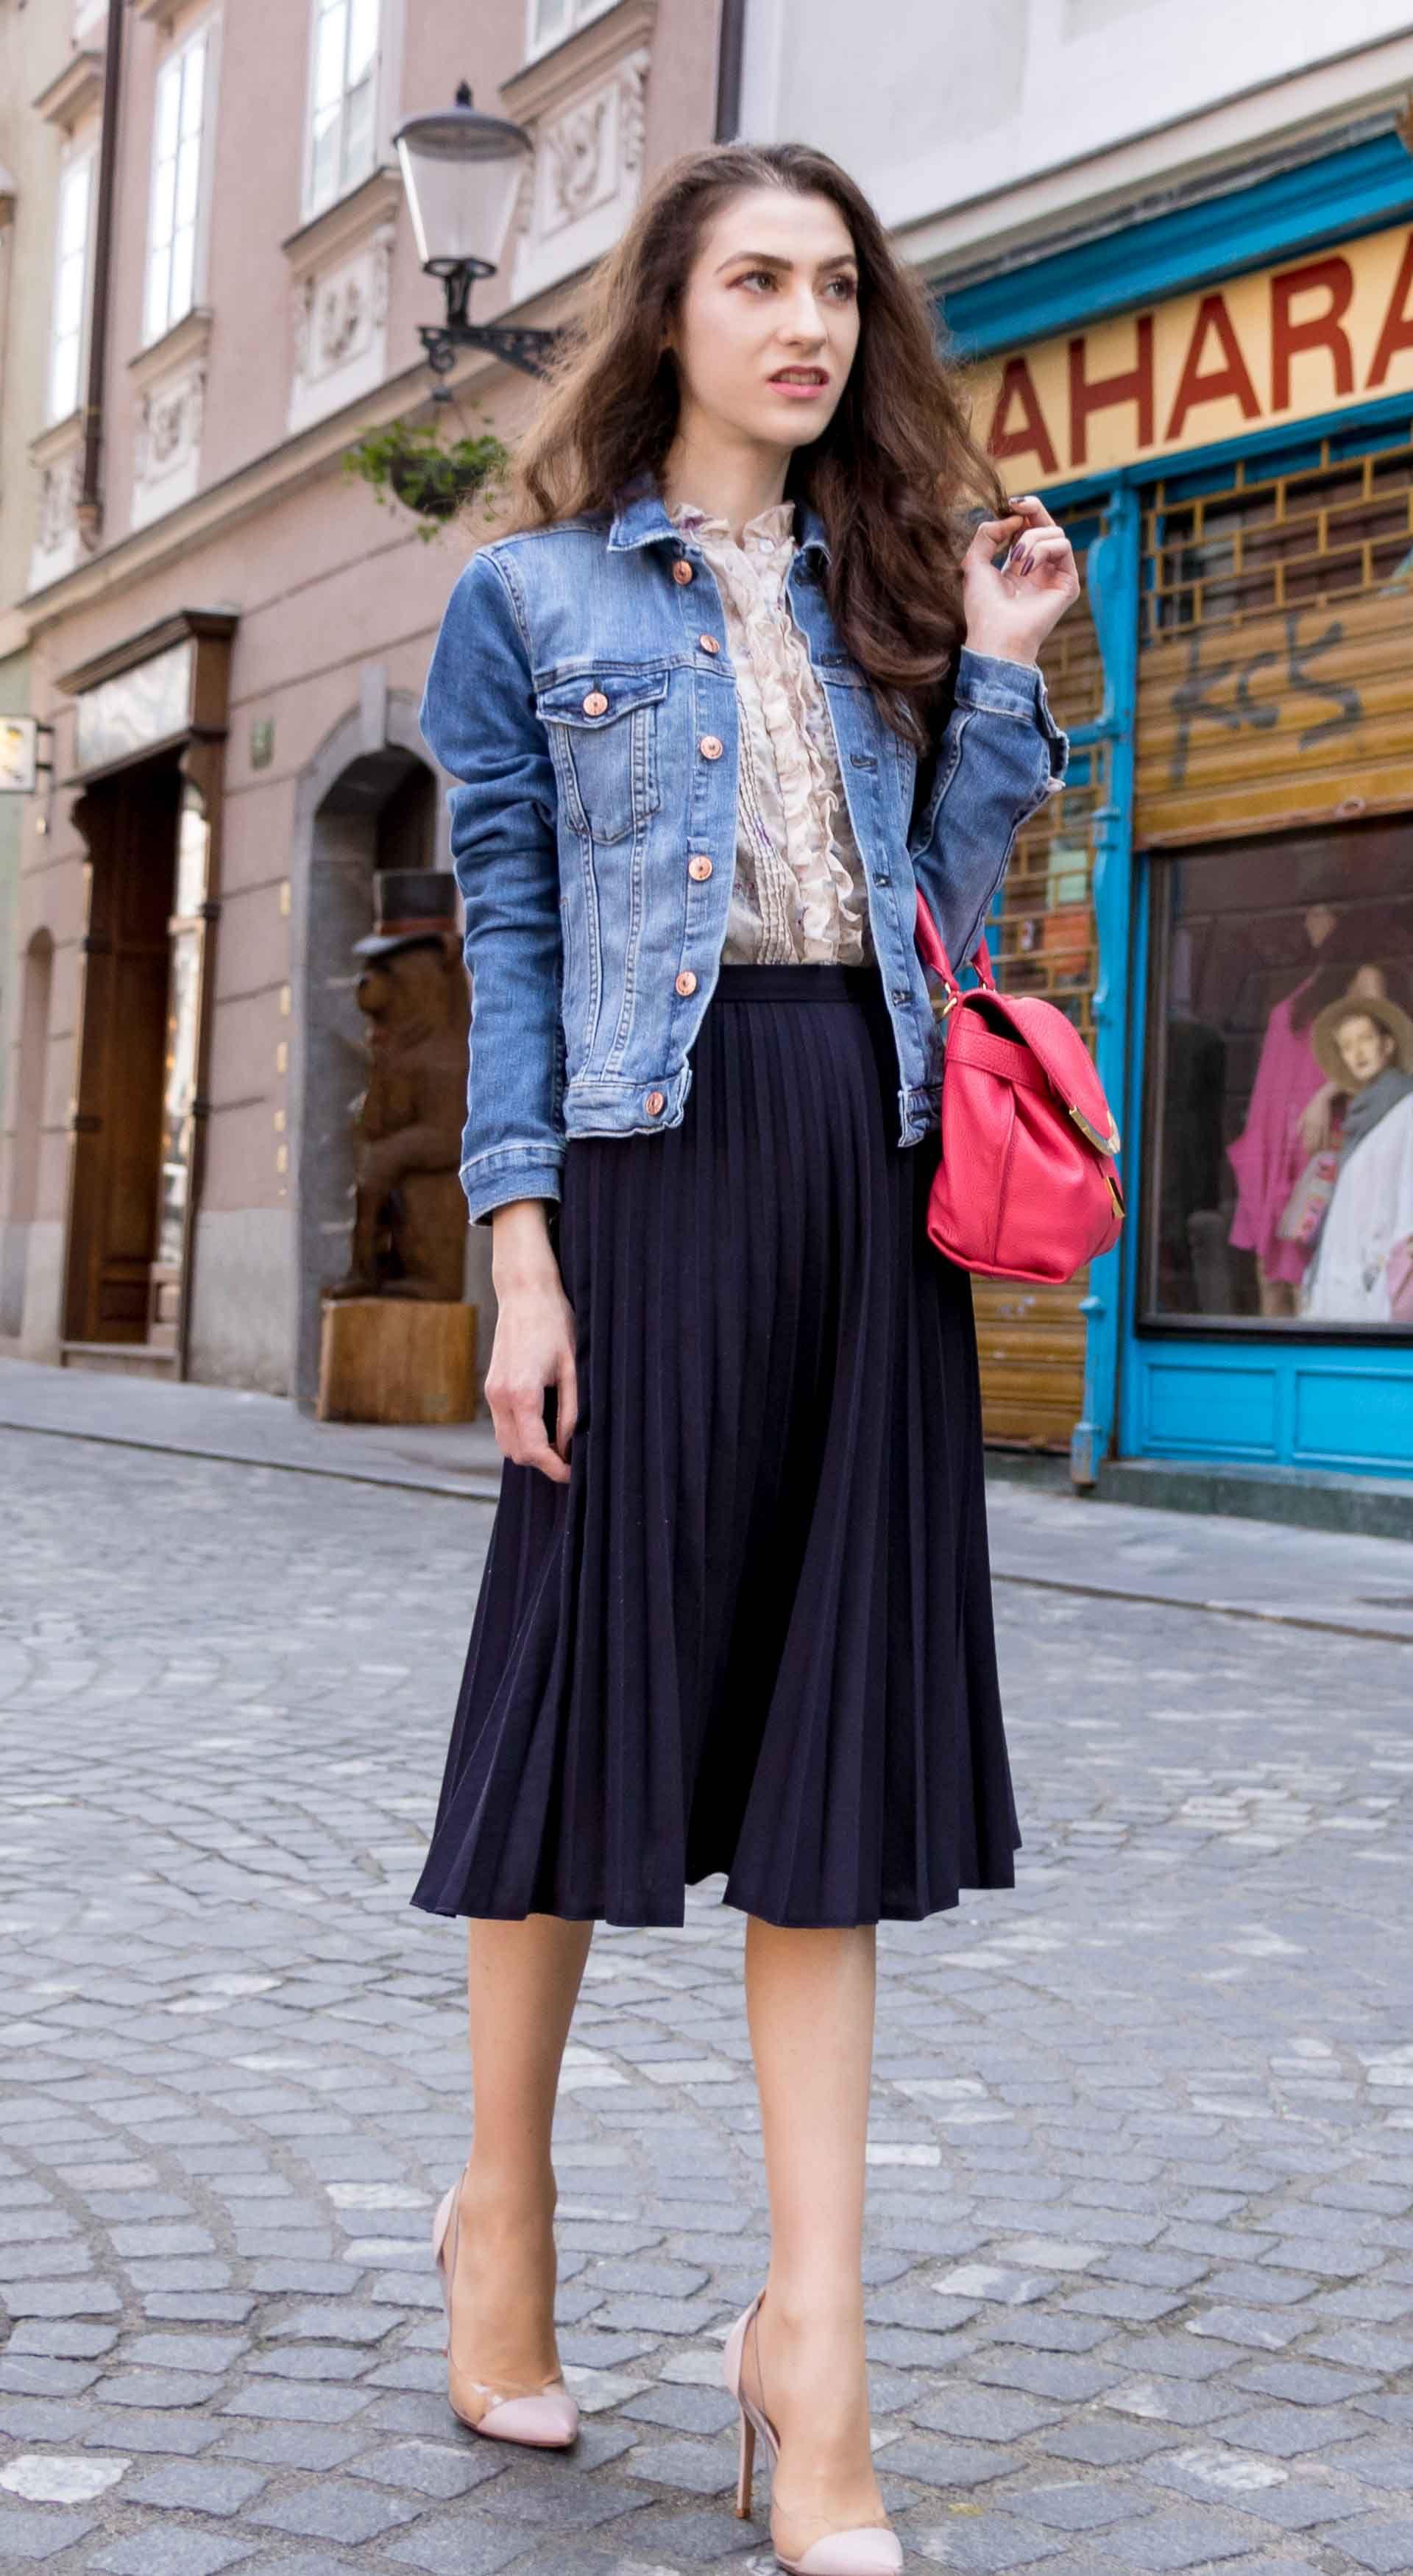 b9d7313293 Veronika Lipar Fashion Blogger of Brunette from Wall Street wearing H&M  denim jacket, floral blouse, midi pleated skirt, Gianvito Rossi plexi  pumps, ...